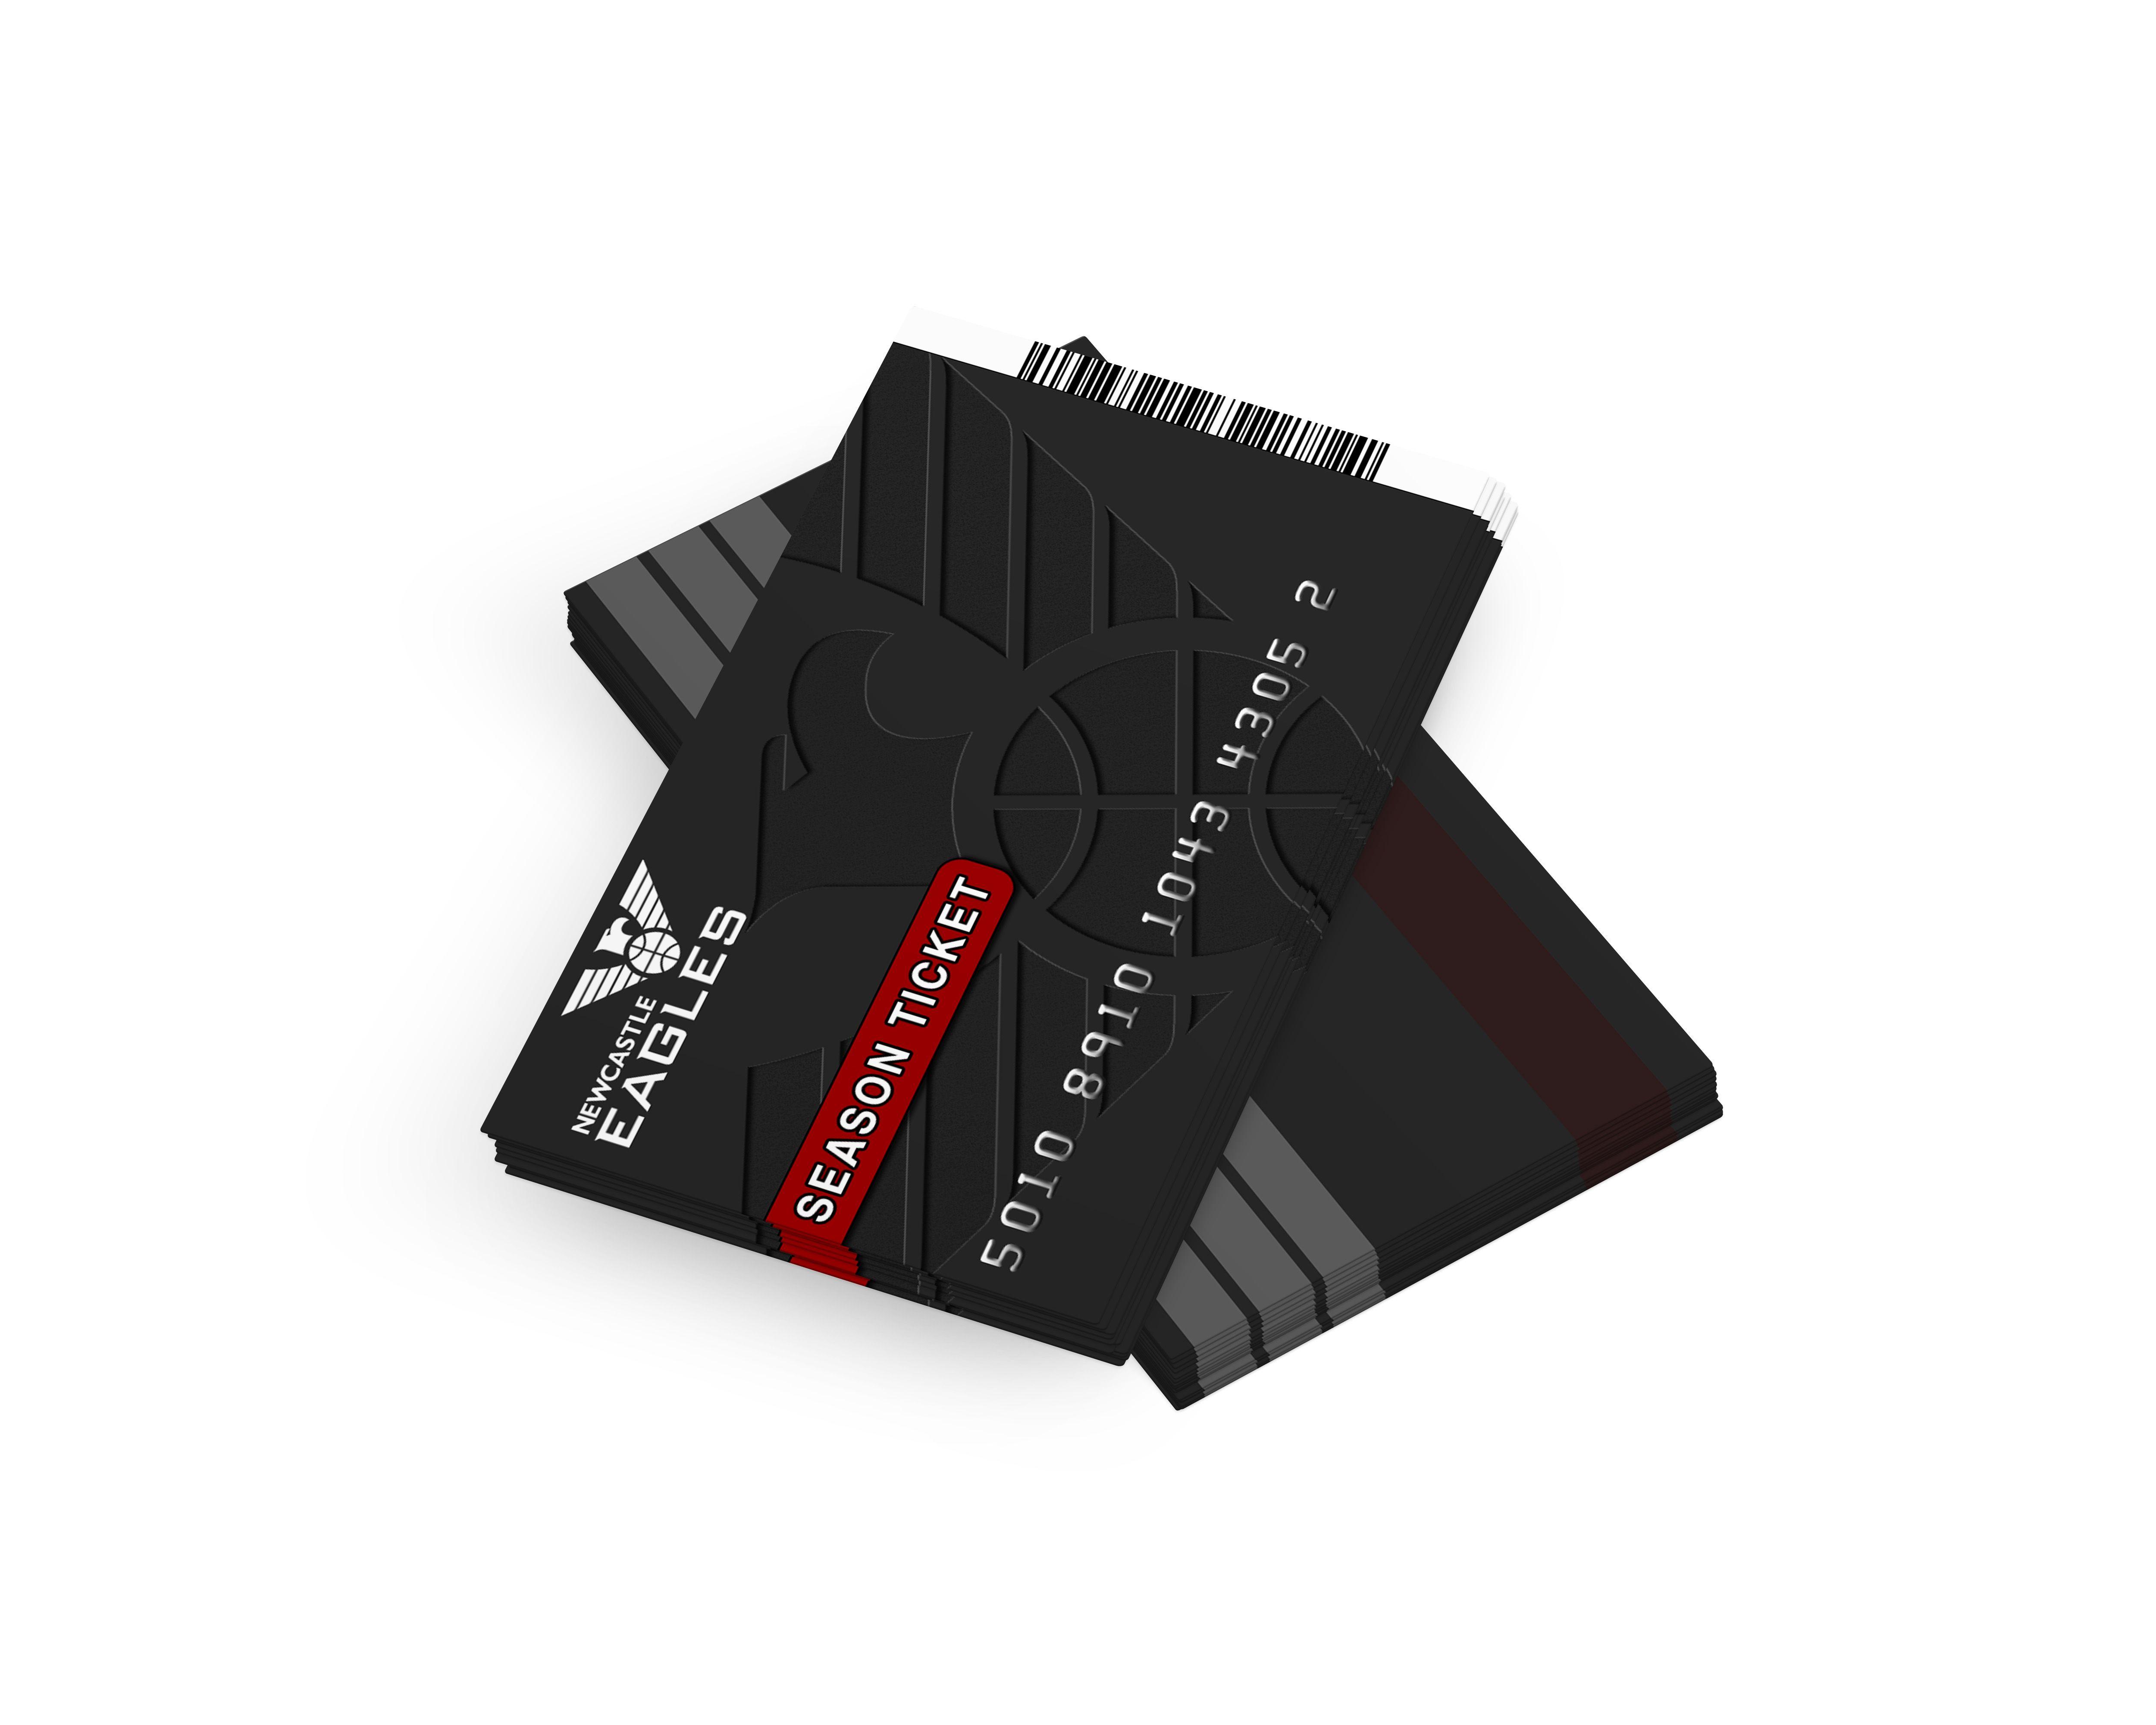 Newcastle Eagles, Plastic Season Ticket, Card Design | Business ...